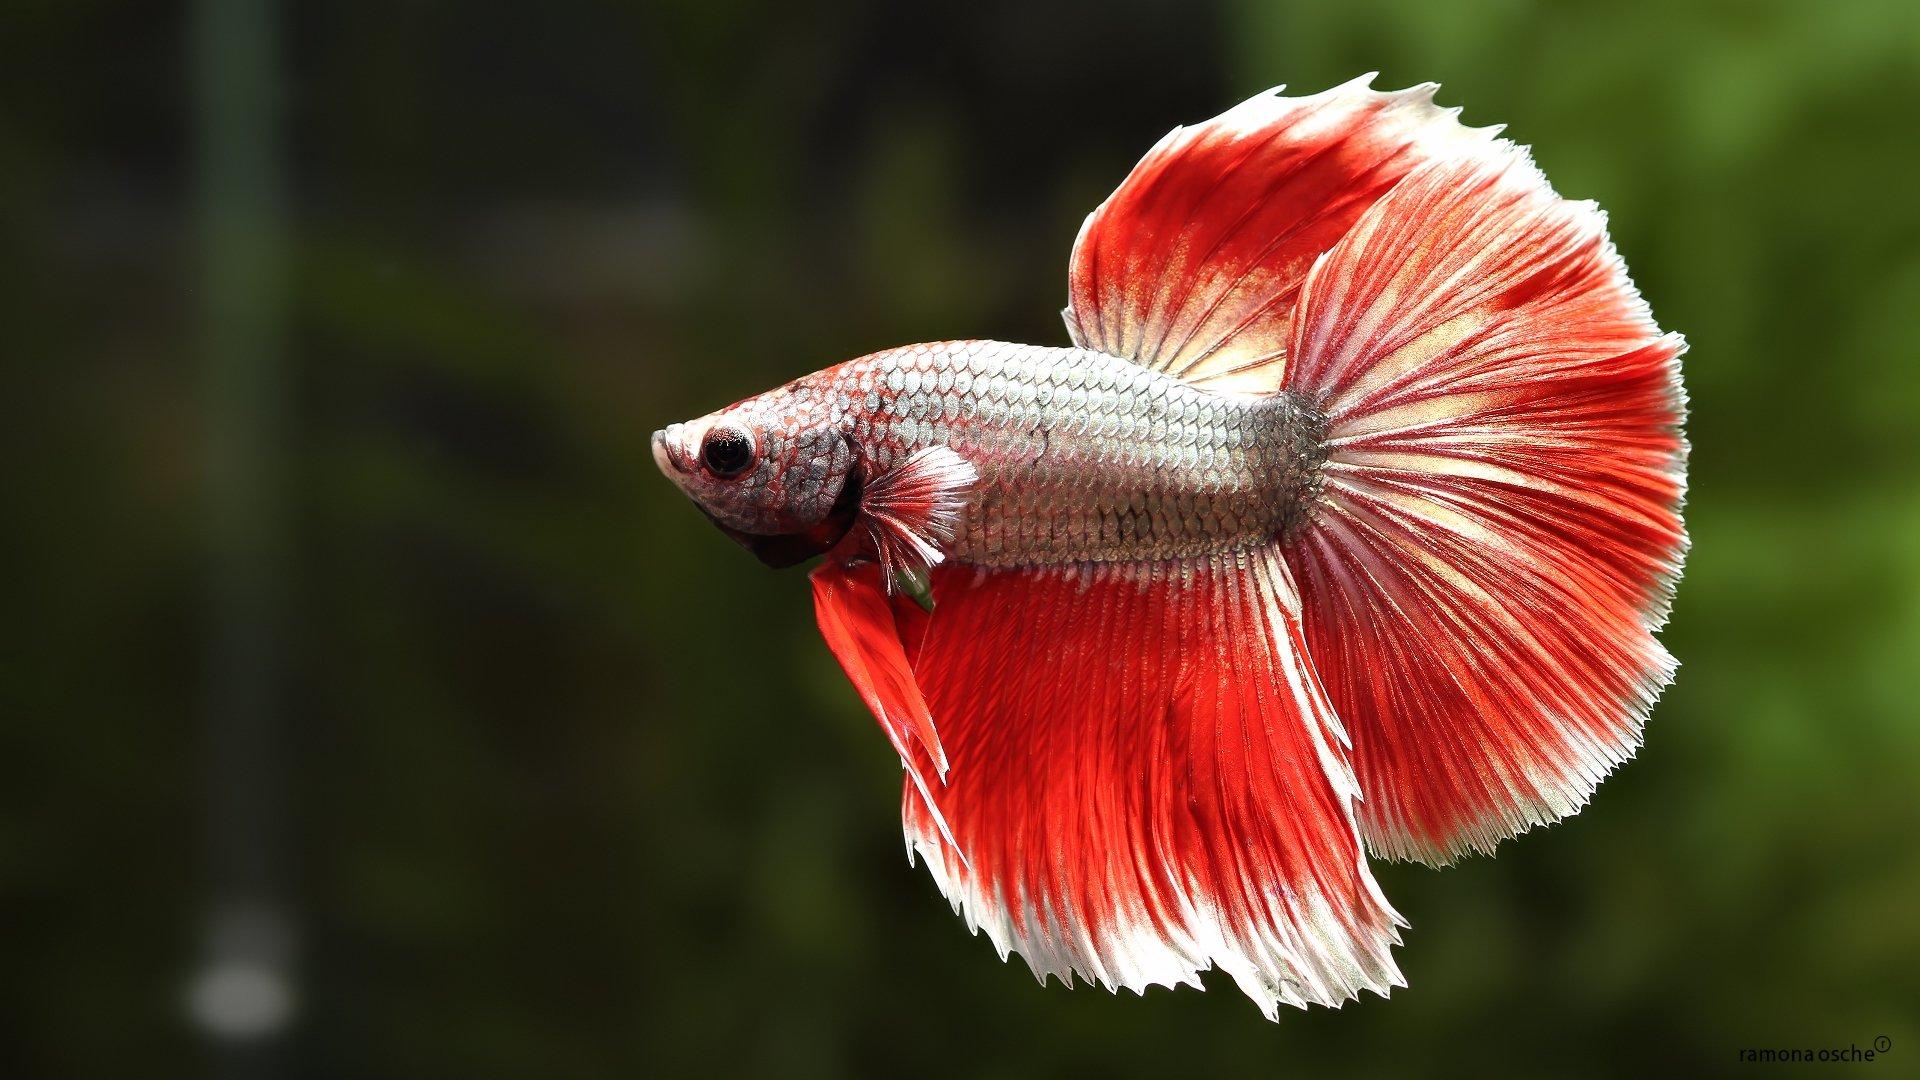 Download Koi Fish 3d Wallpaper Betta Siamese Fighting Fish Colorful Tropical Wallpaper